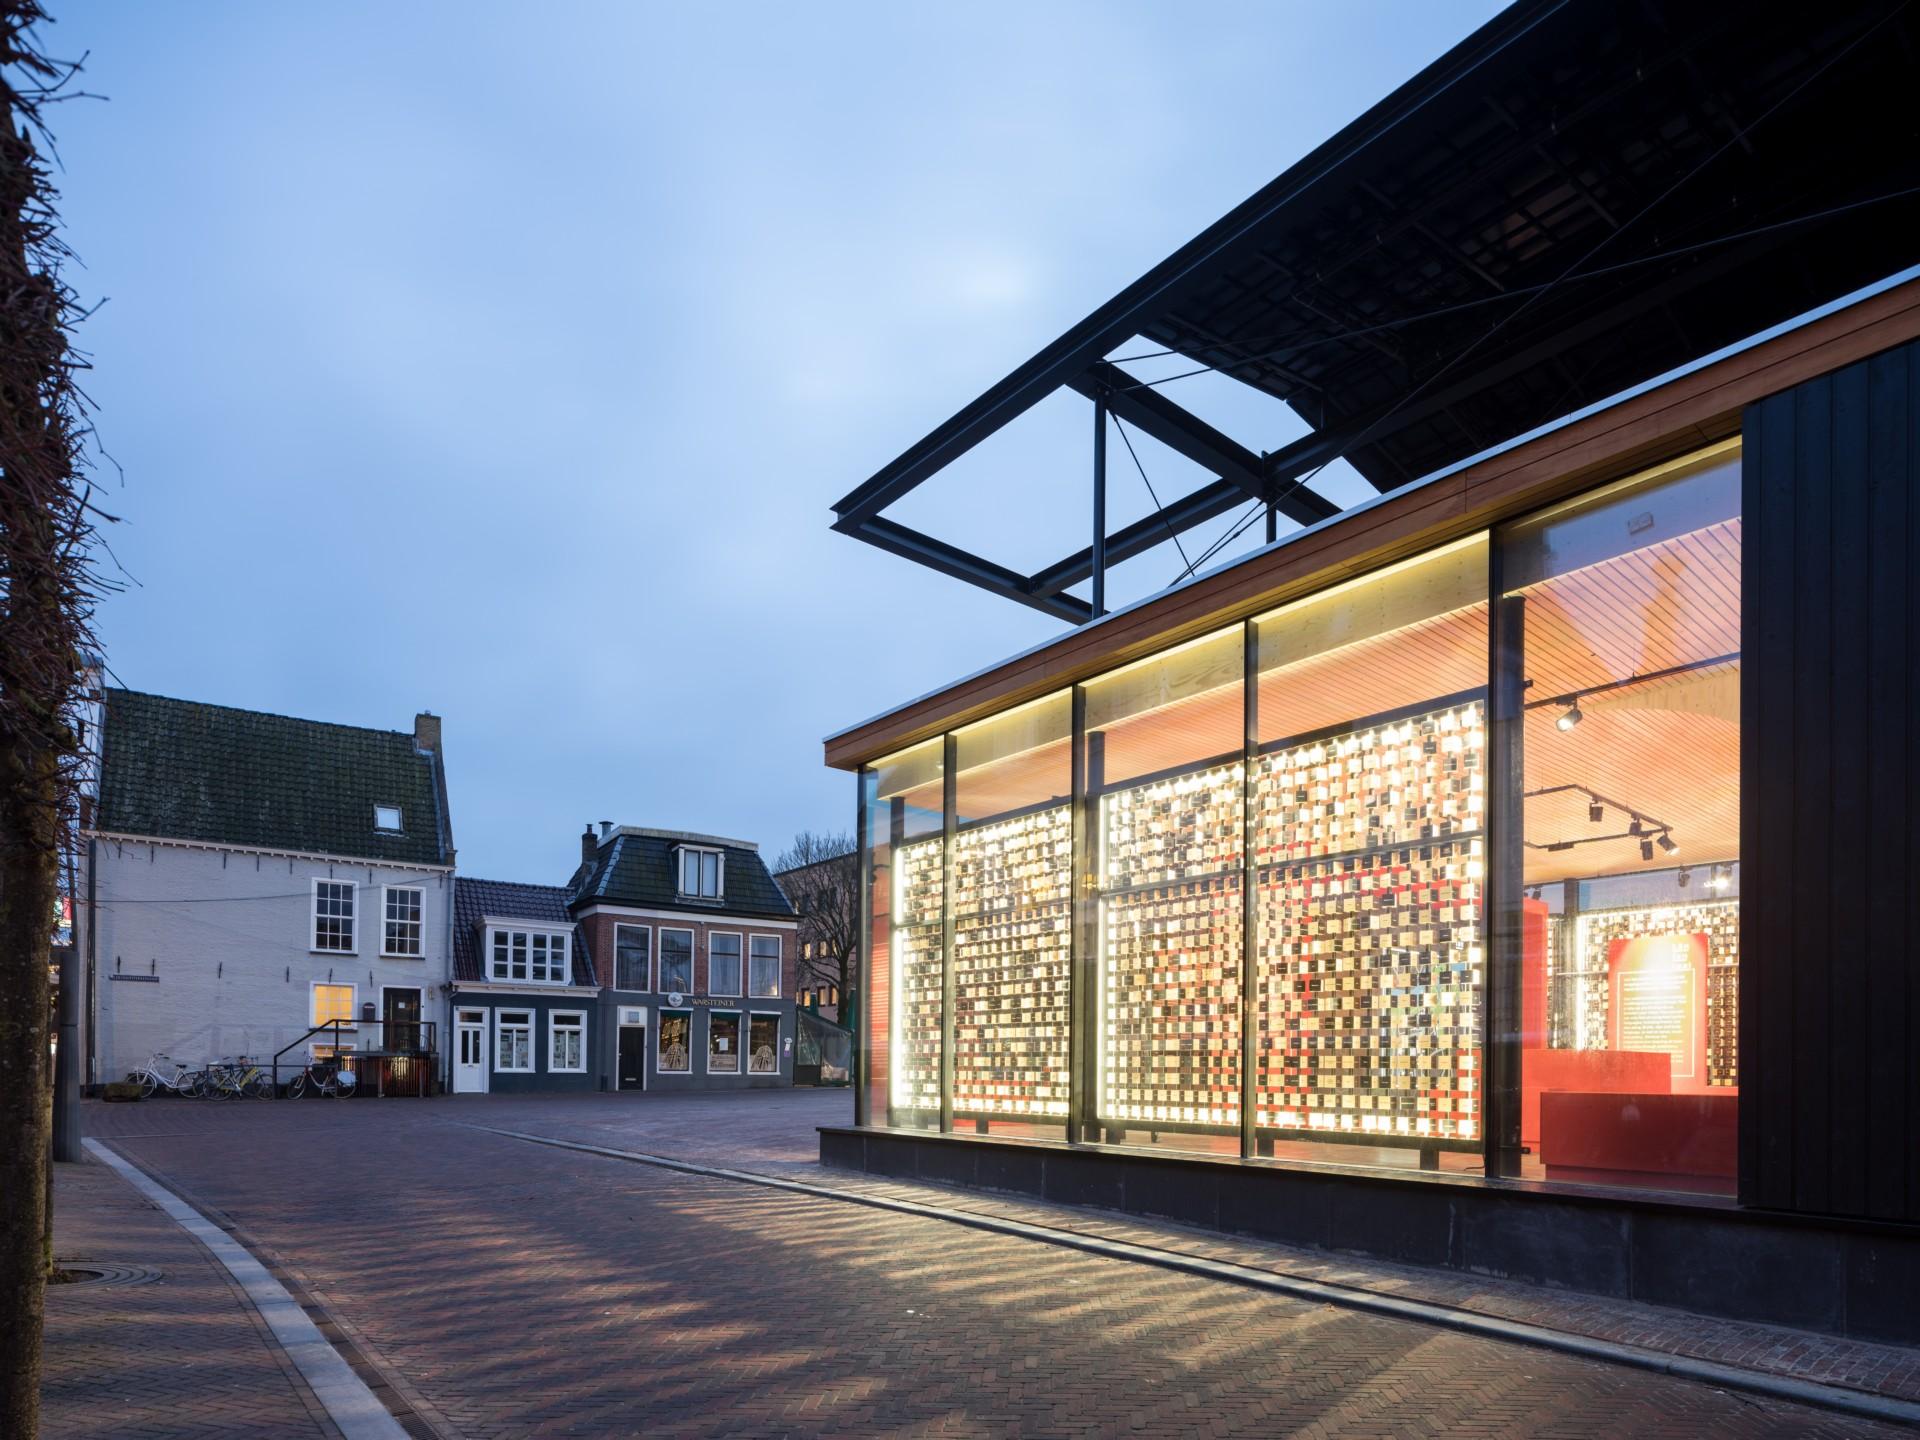 Powerhouse Company Obe Pavilion in Leeuwarden European Cultural Capital of 2018